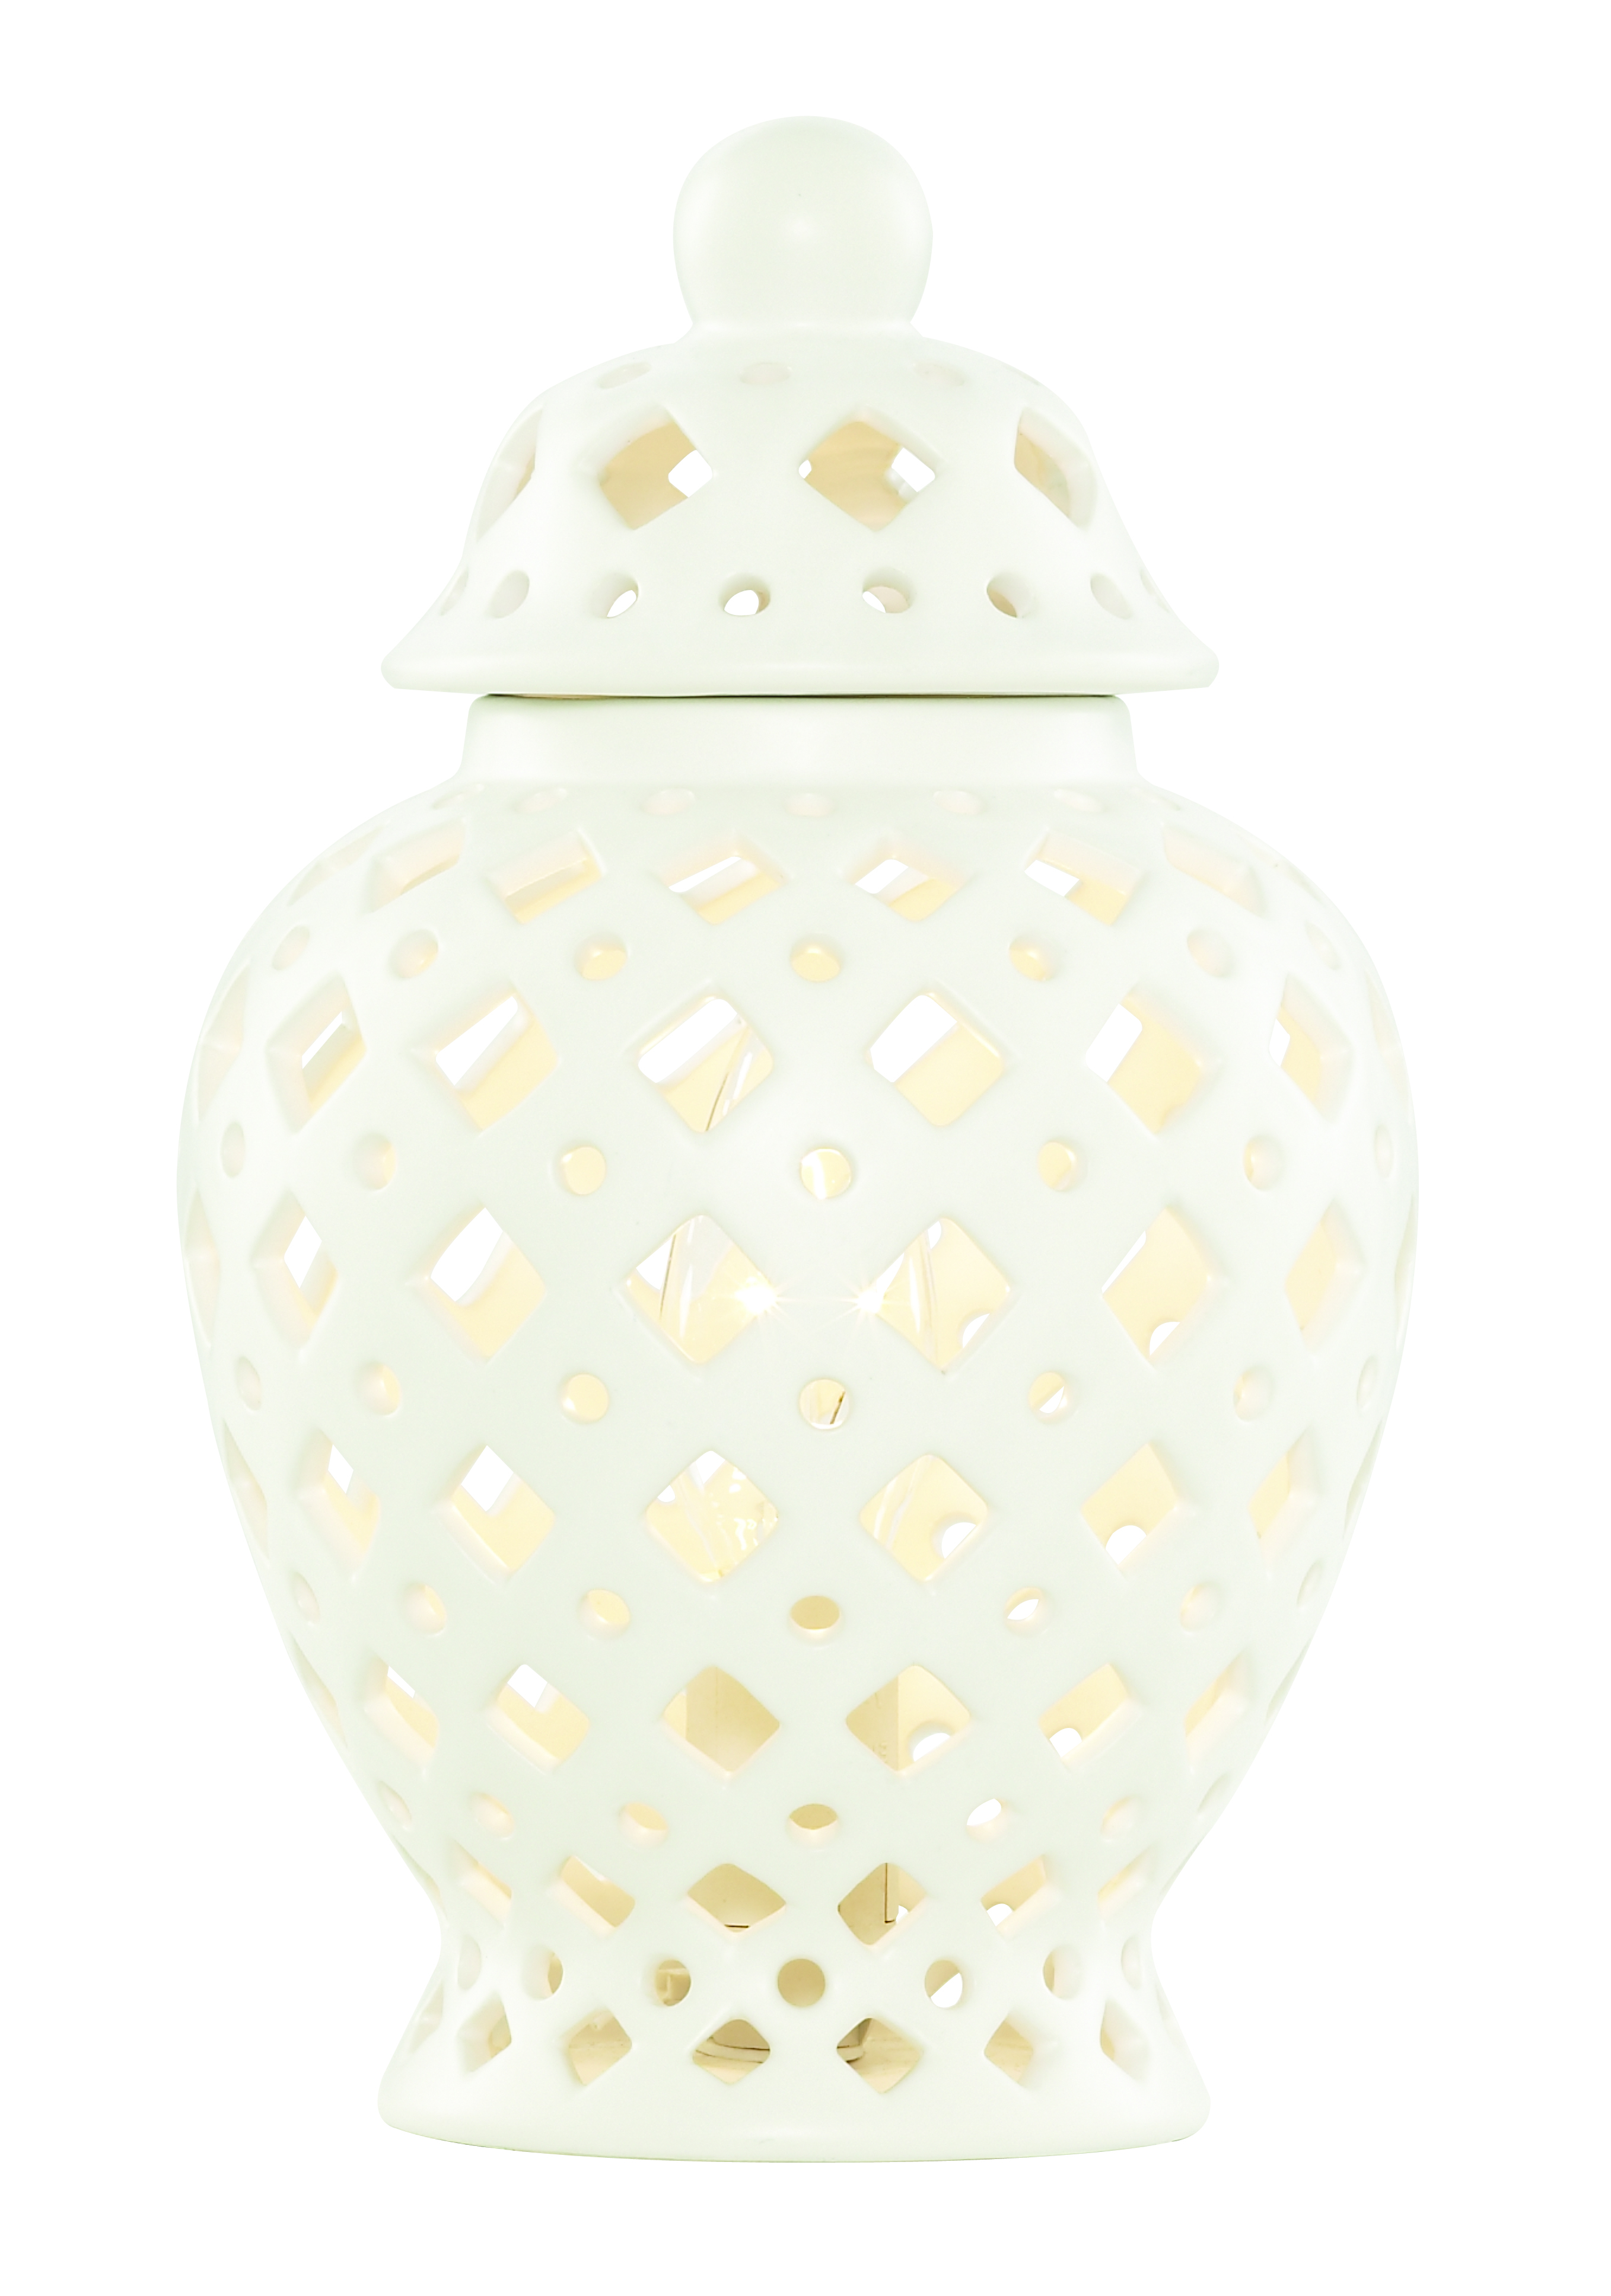 PAGAZZI Ginger Pot Table Lamp White £45